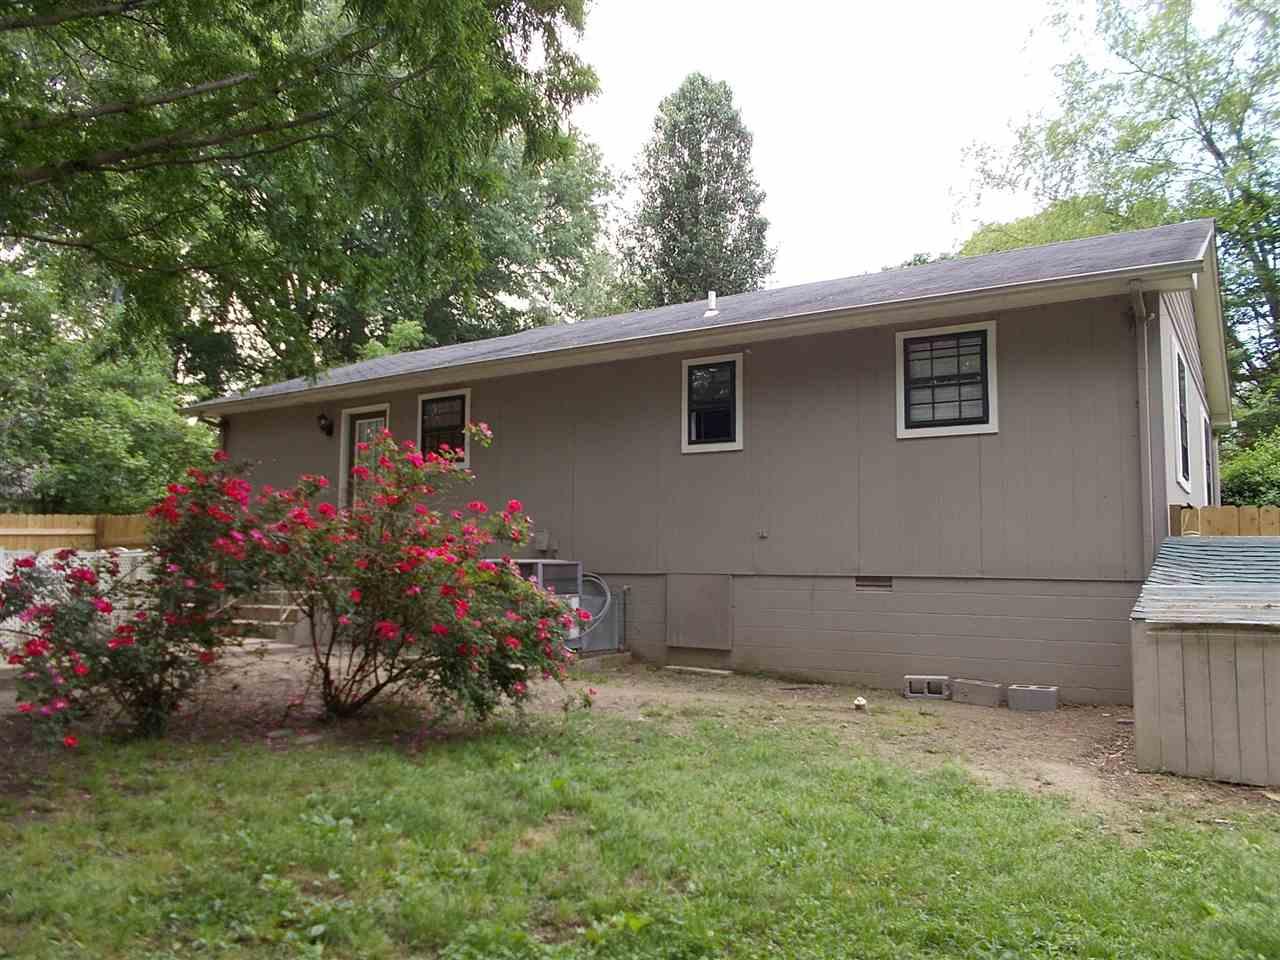 1120 Ridgeway Dyersburg, TN 38024 - MLS #: 10026733